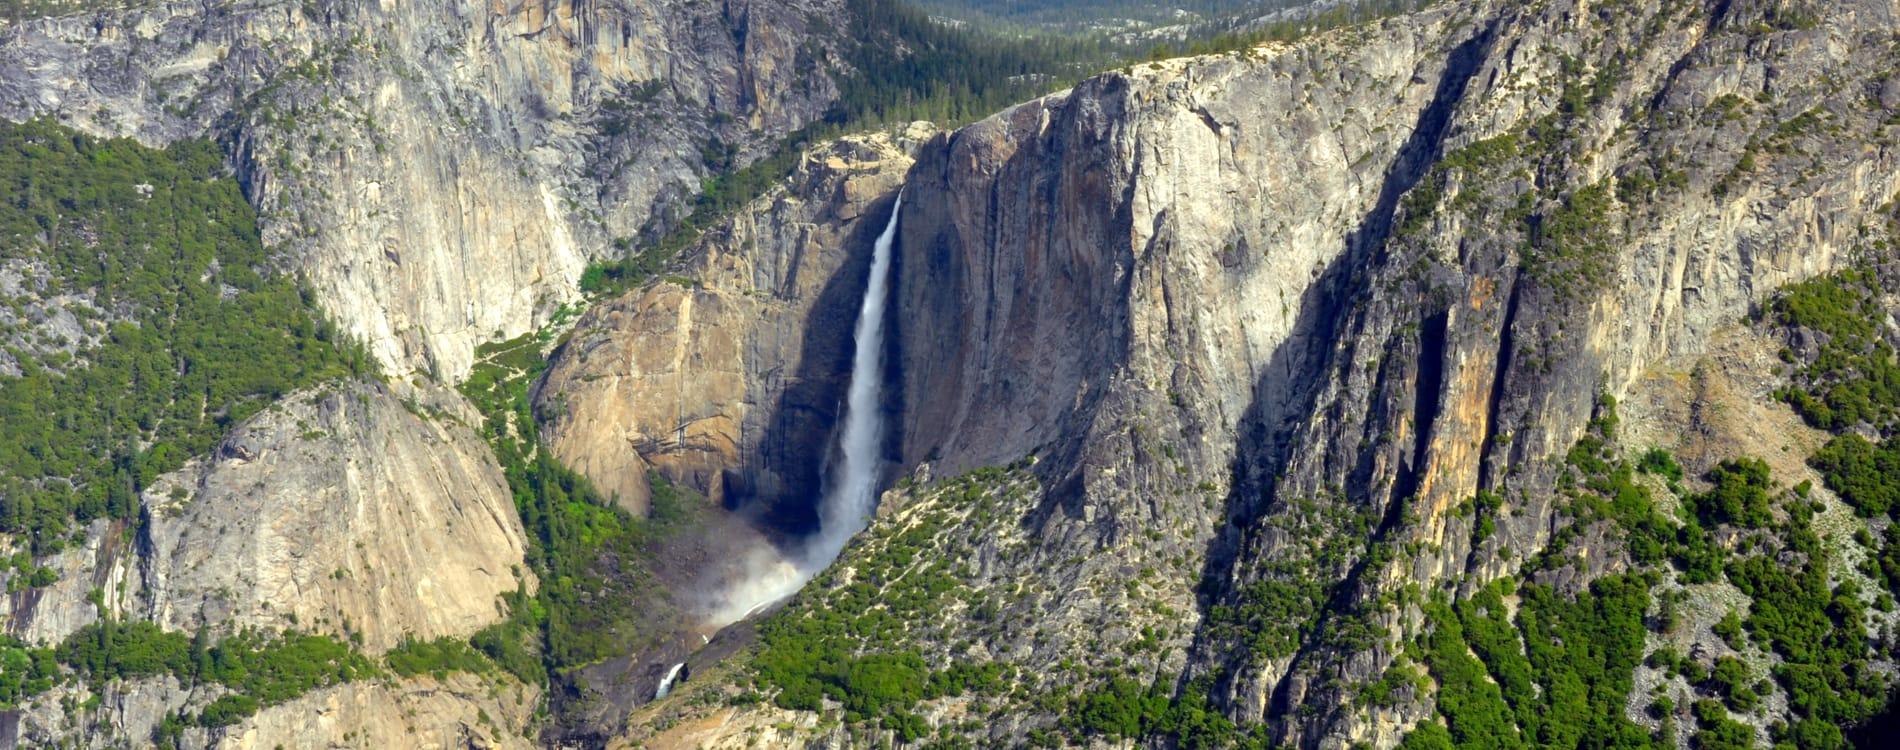 Yosemite National Park - Upper Yosemite Falls from Glacier Point